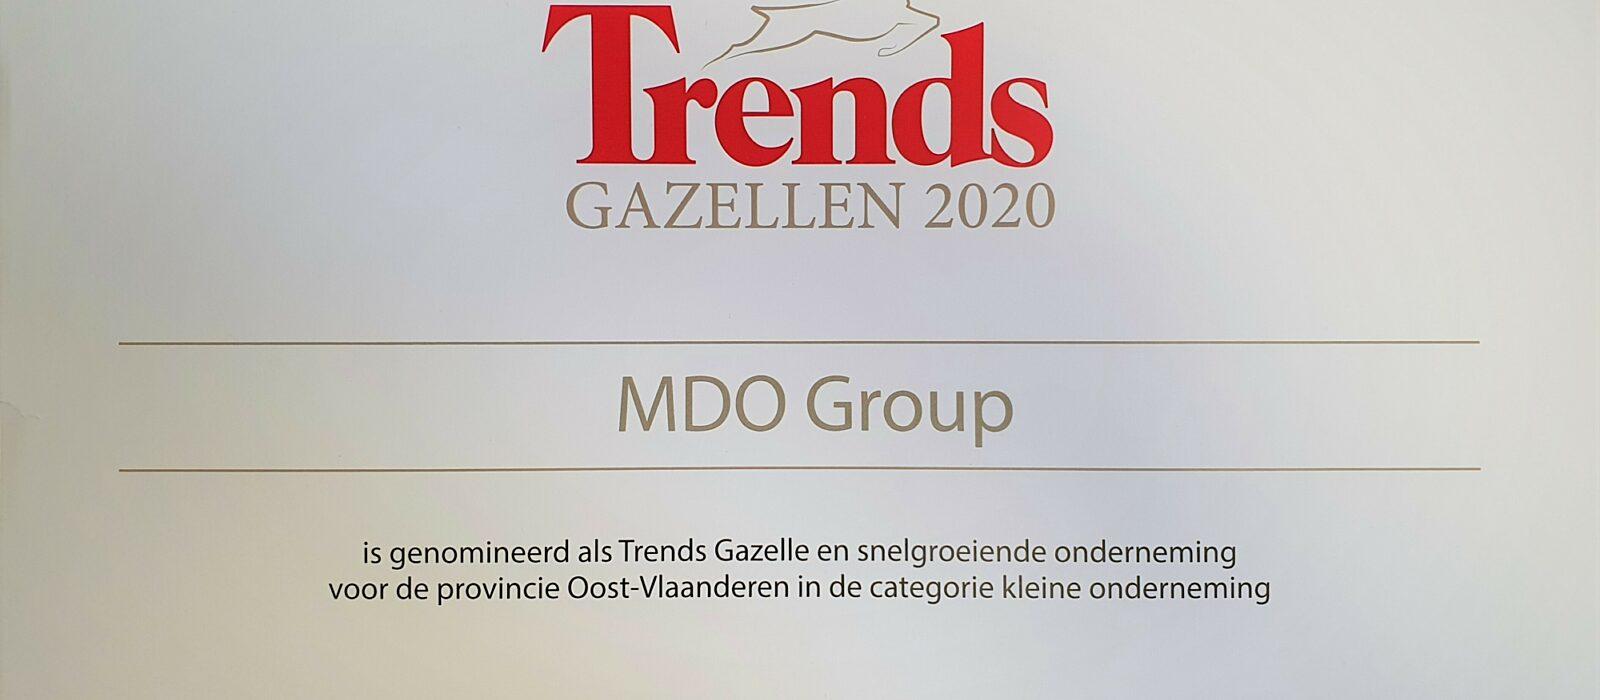 Trends Gazelle Nominatie 2020 MDO GROUP